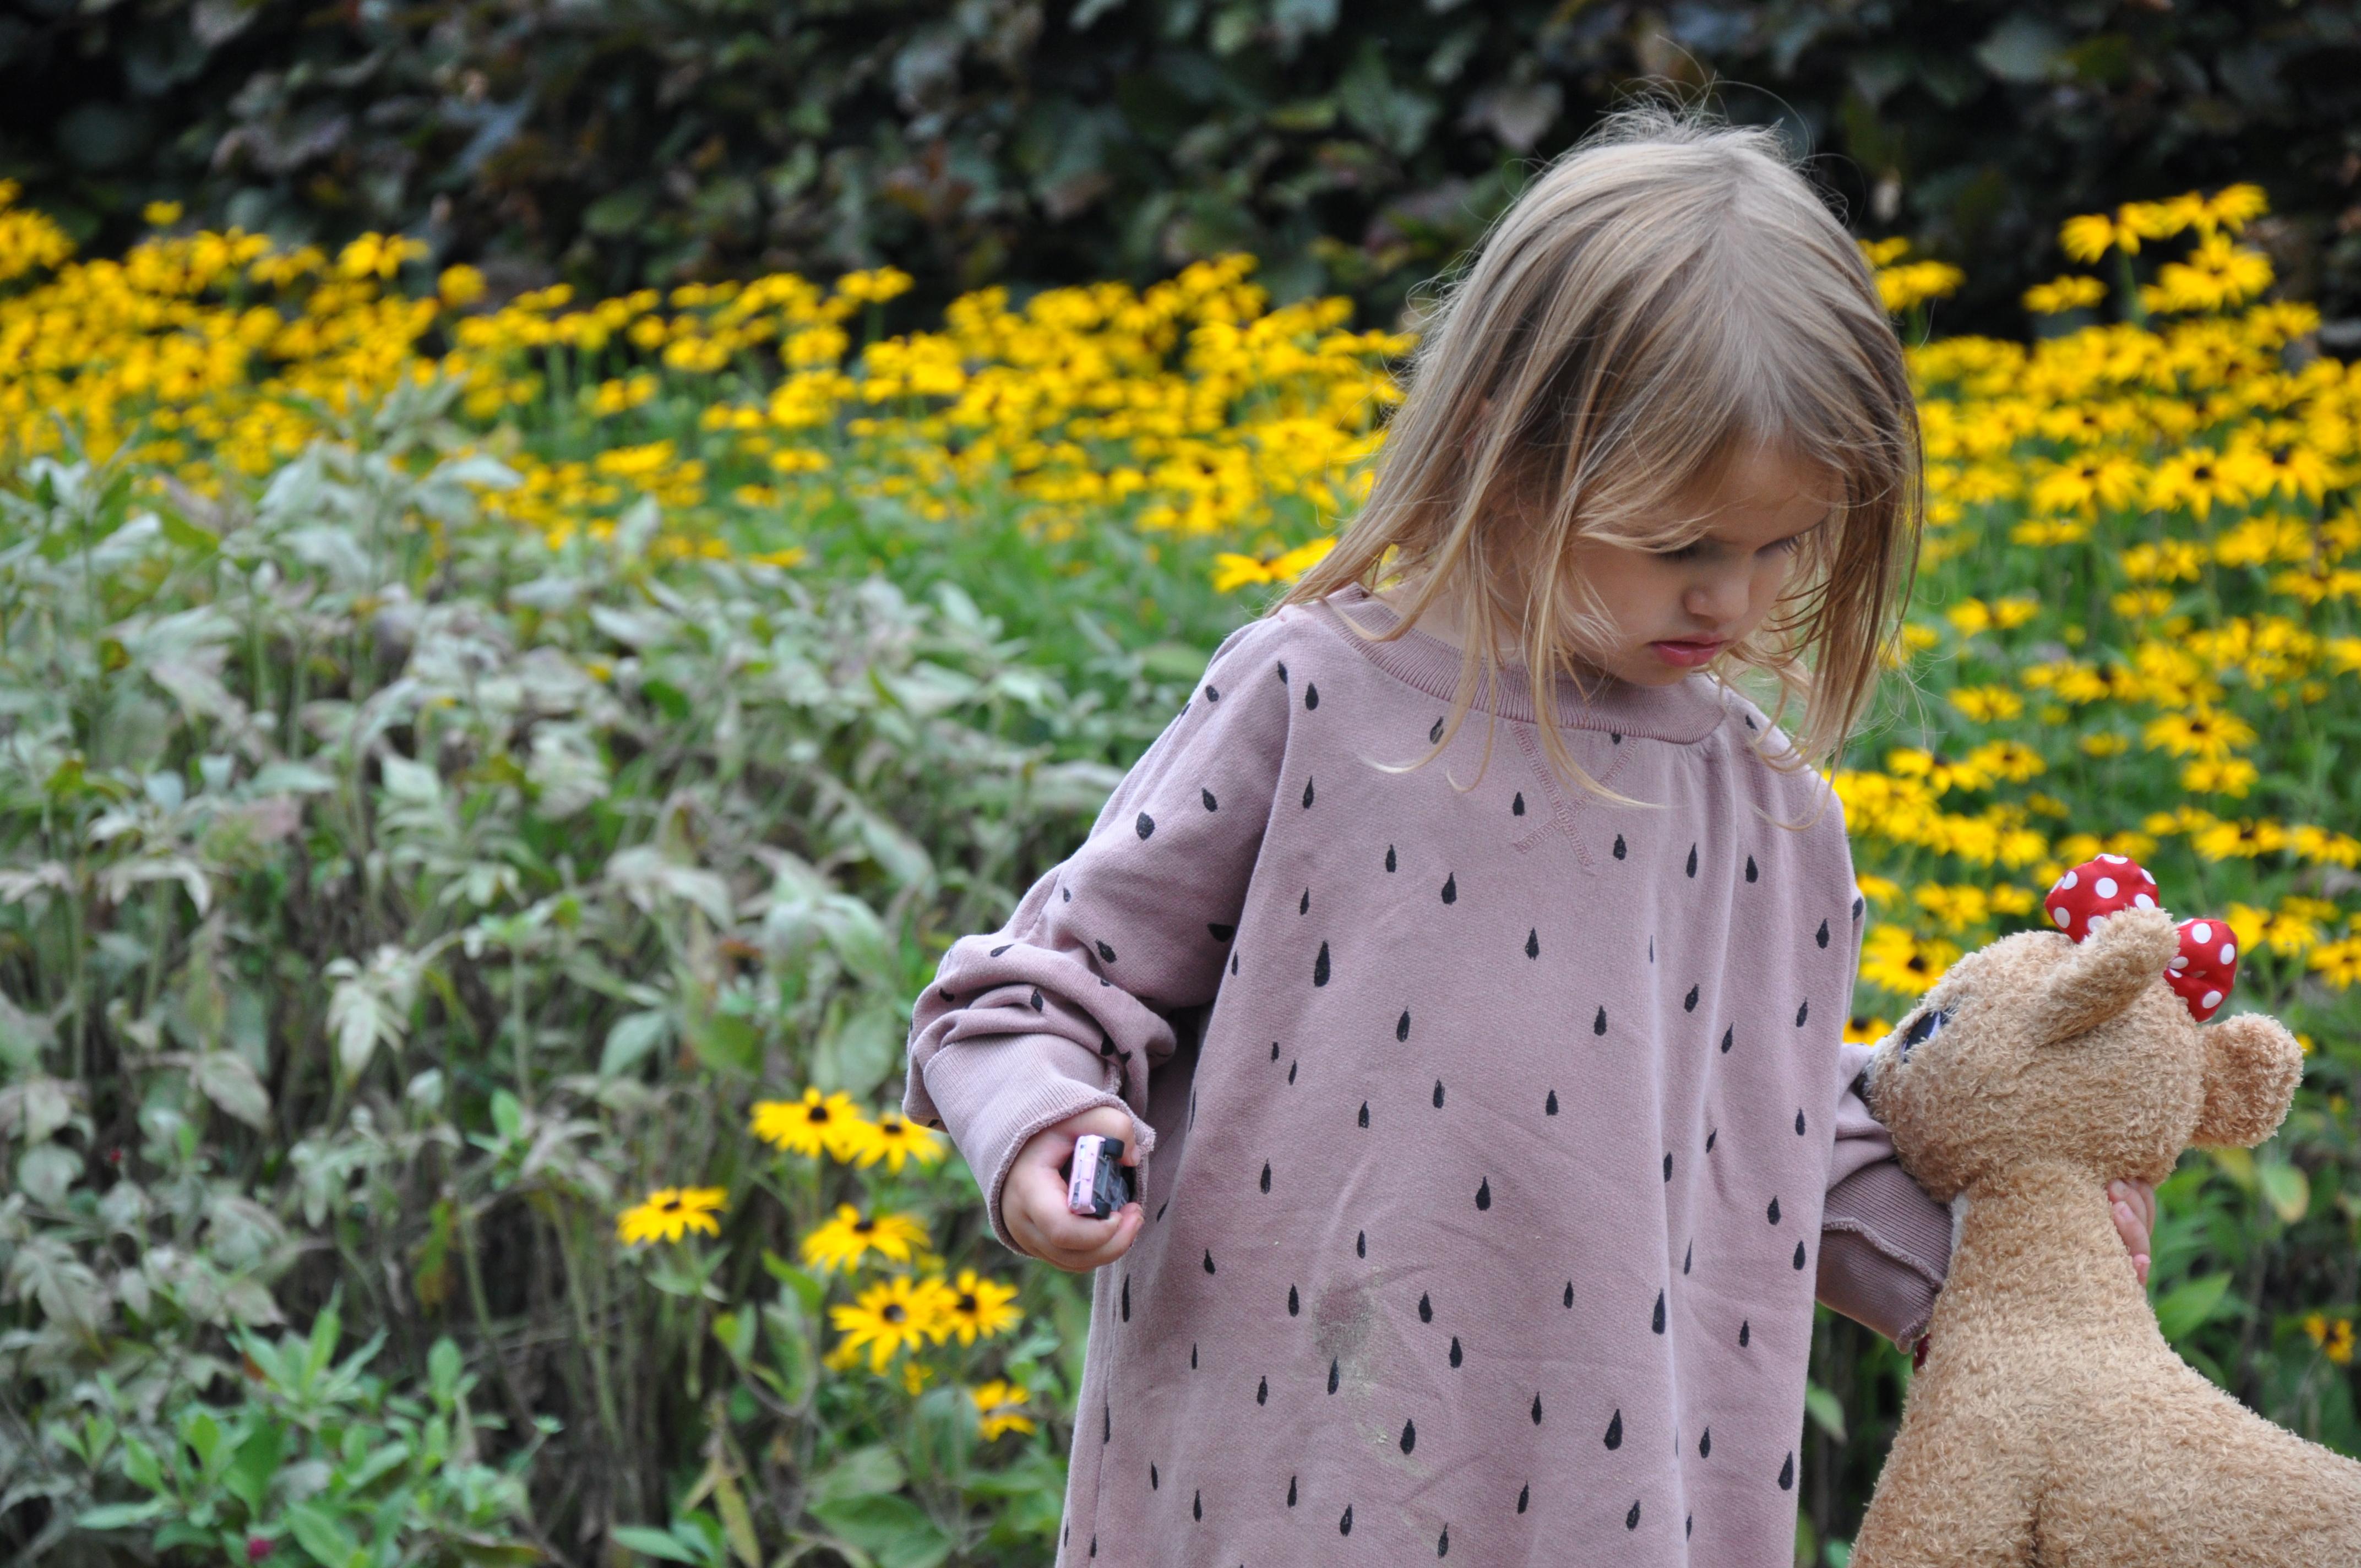 Bobo_choses_dress_yellow_flowers